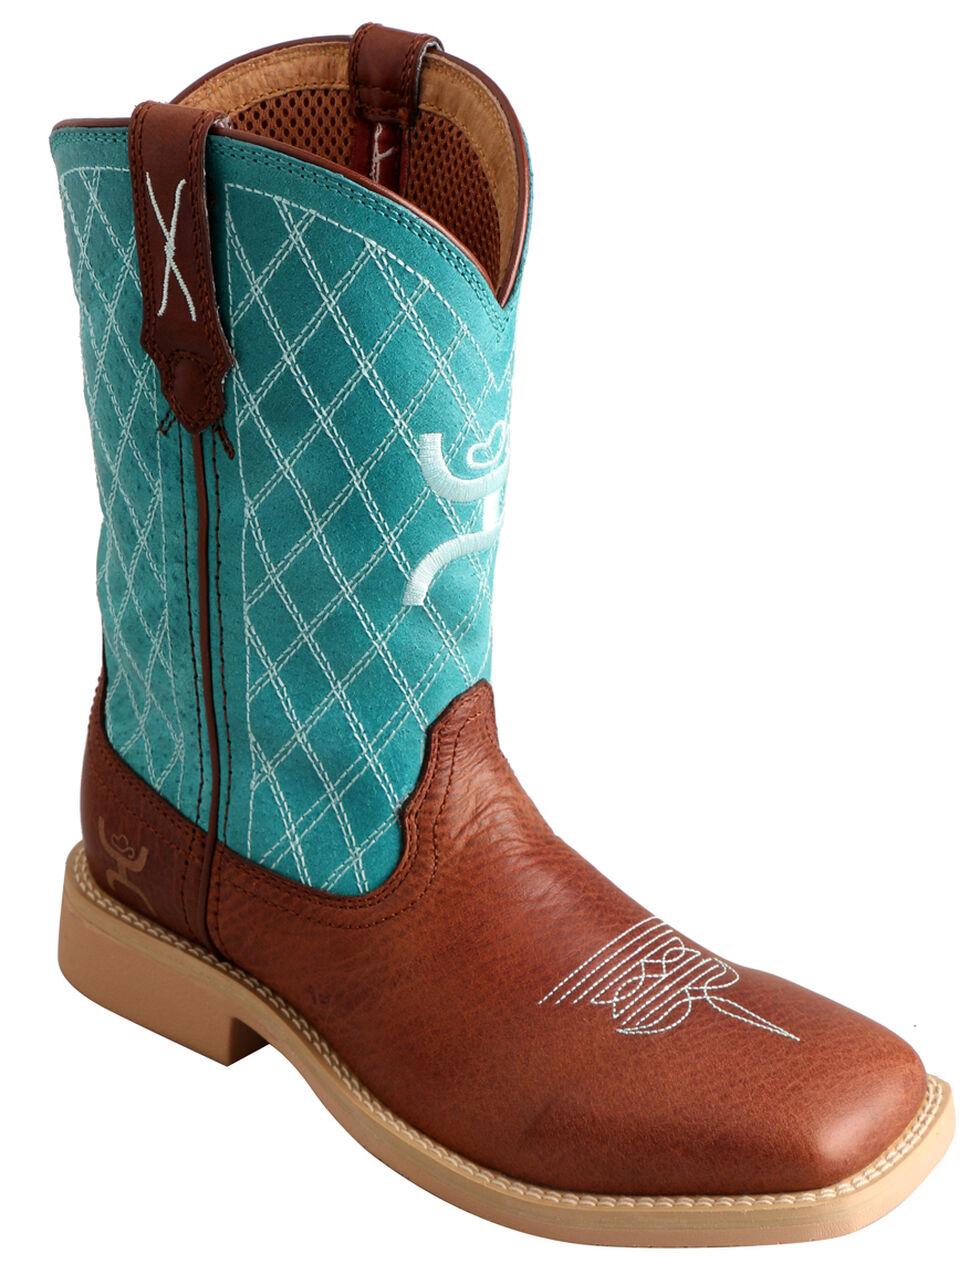 Twisted X Kid's Hooey Cowboy Boots - Square Toe, Cognac, hi-res